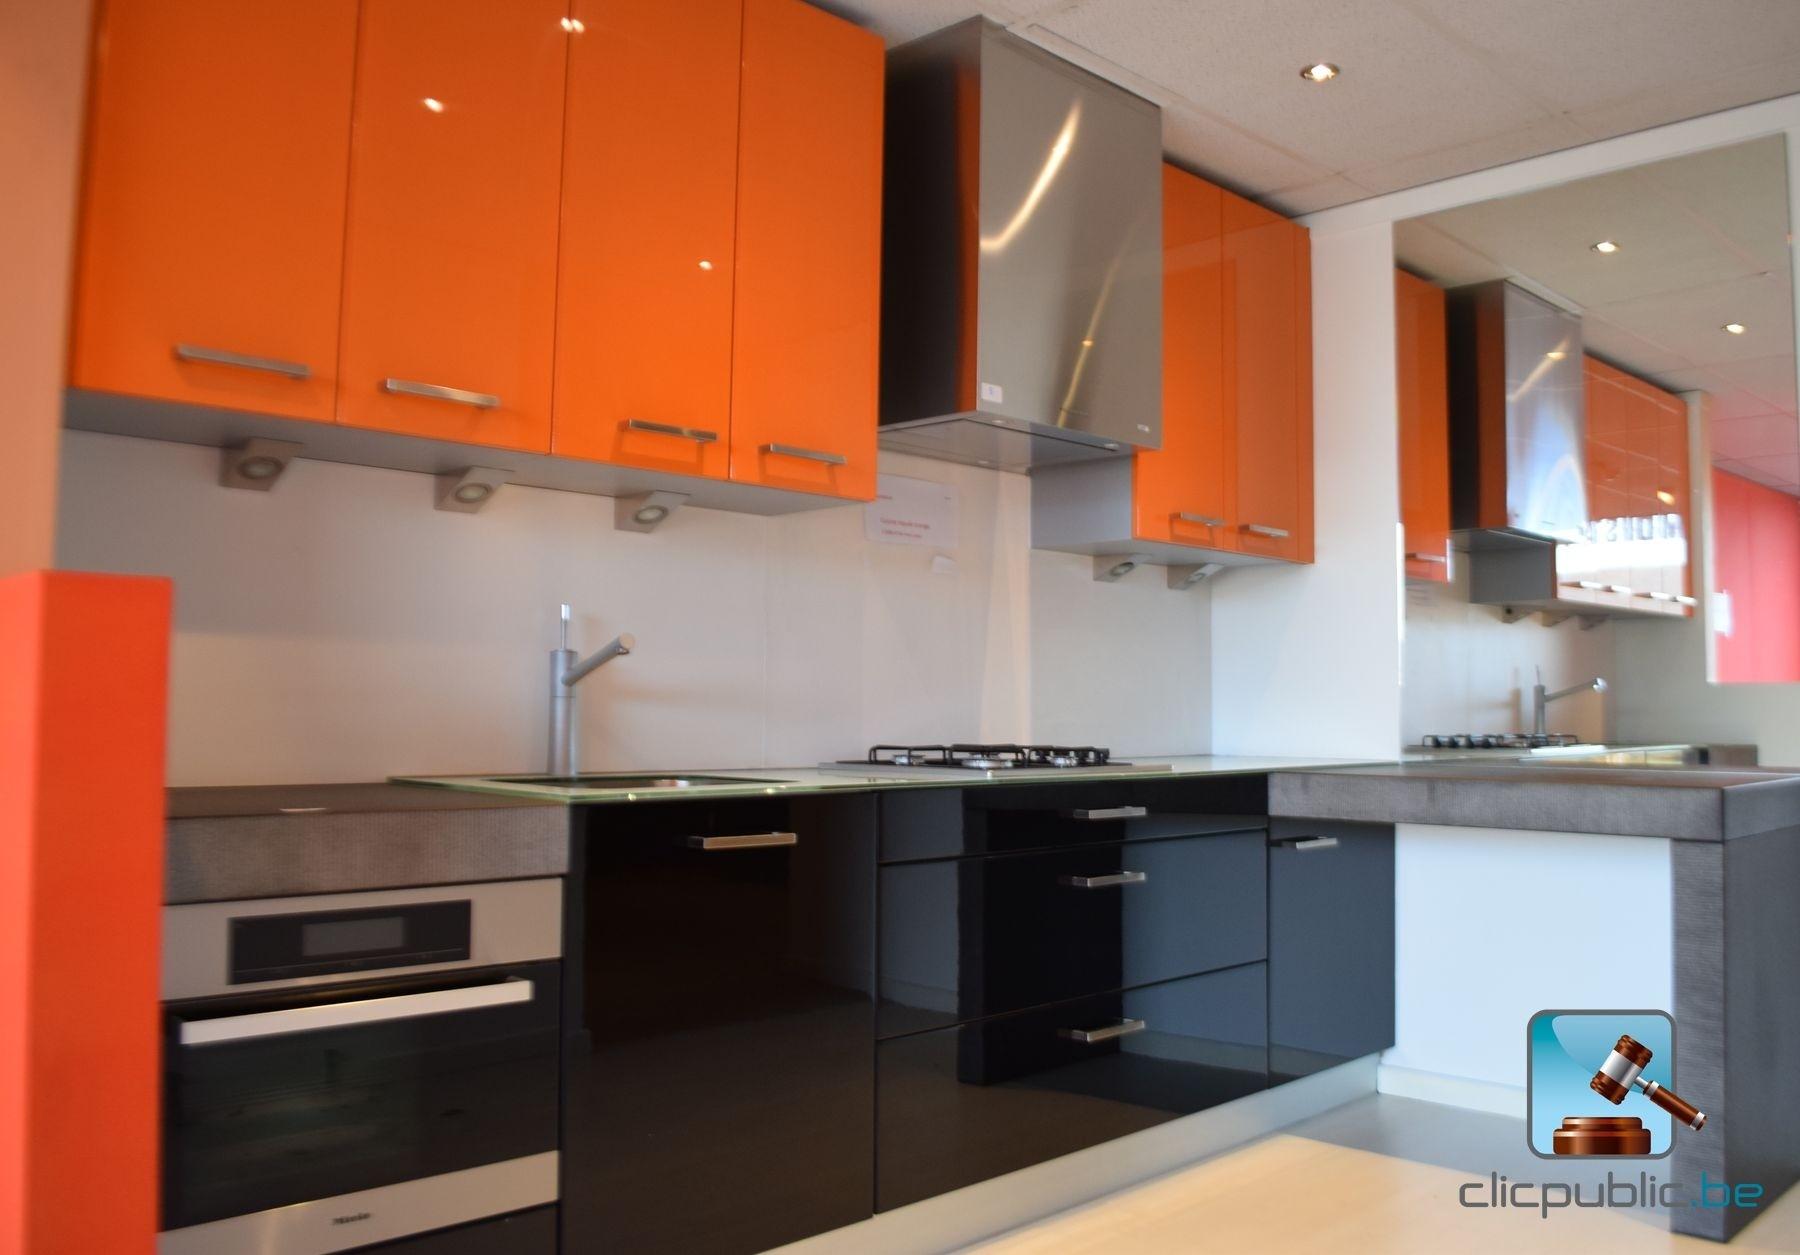 furnished kitchen orange et noir plan de travail topglass. Black Bedroom Furniture Sets. Home Design Ideas